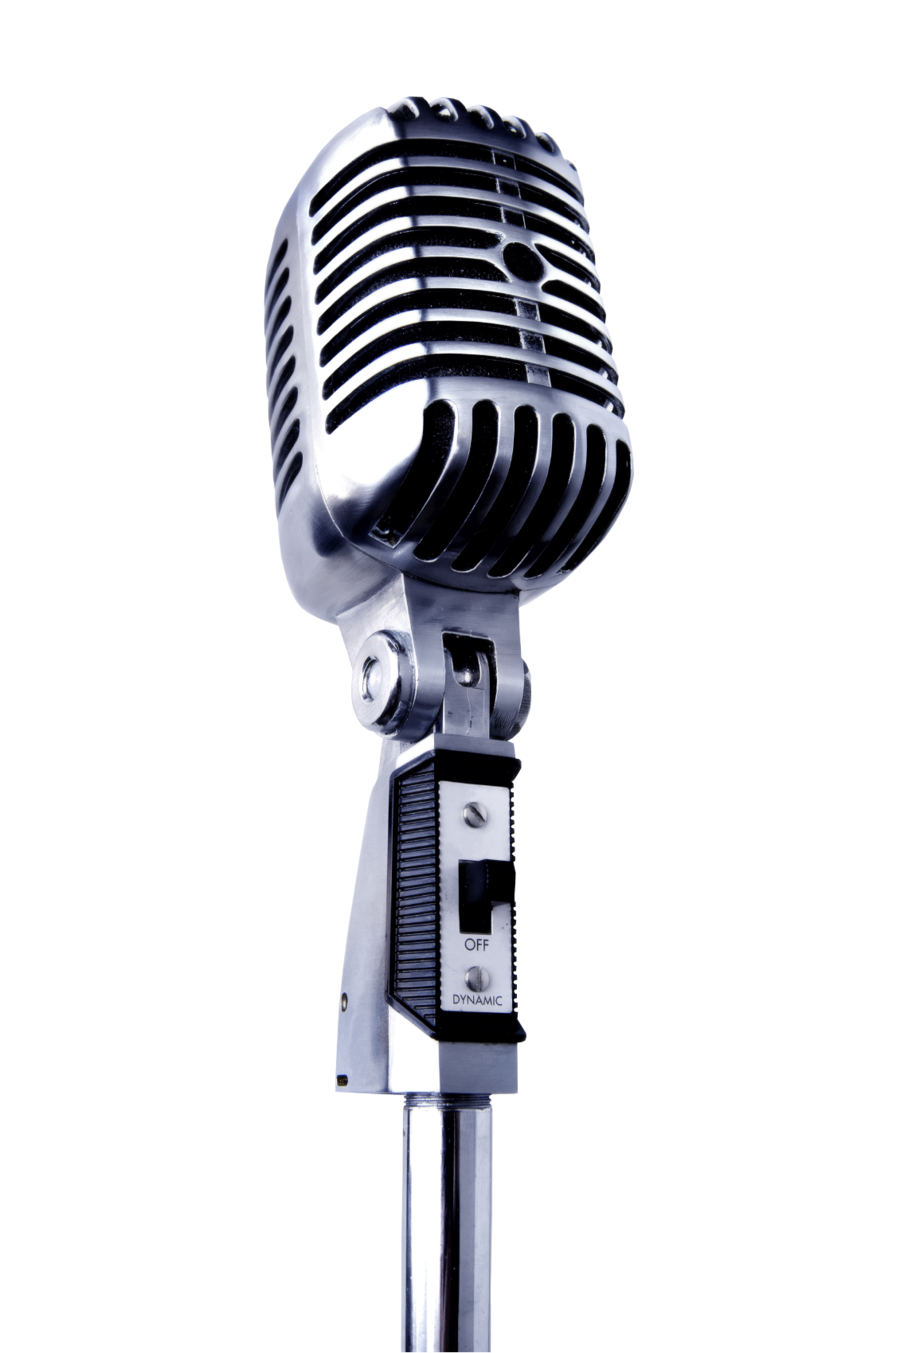 Clipart studio mircophone. Microphone png images transparent